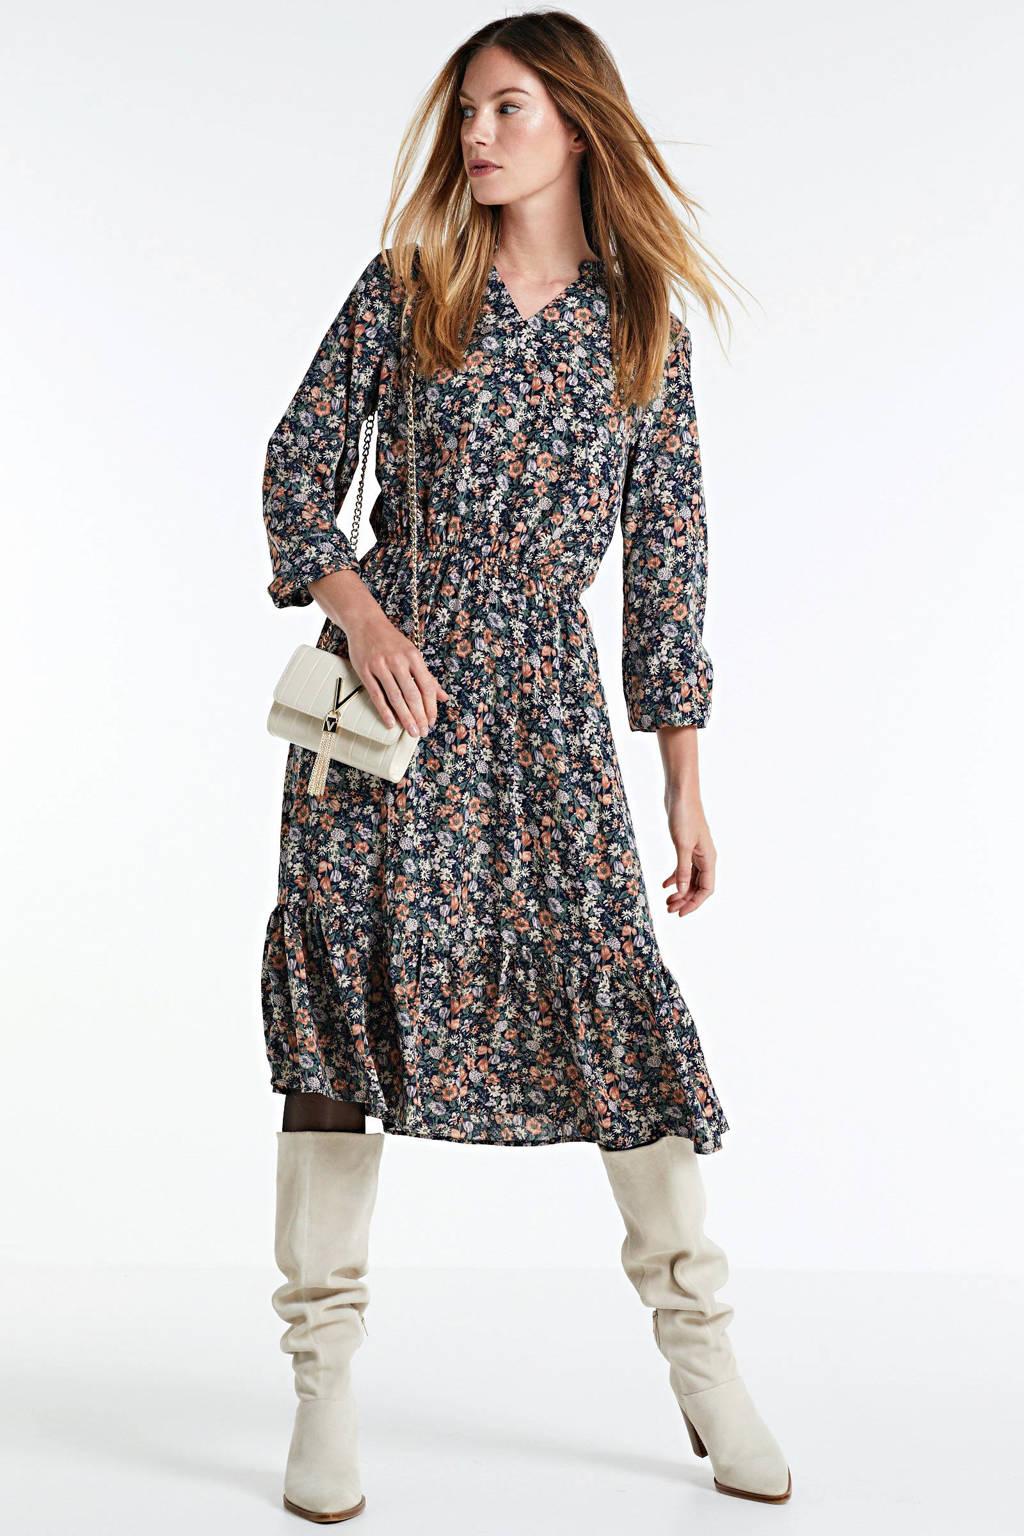 SisterS Point gebloemde maxi jurk Vessi donkerblauw/multi, Donkerblauw/multi